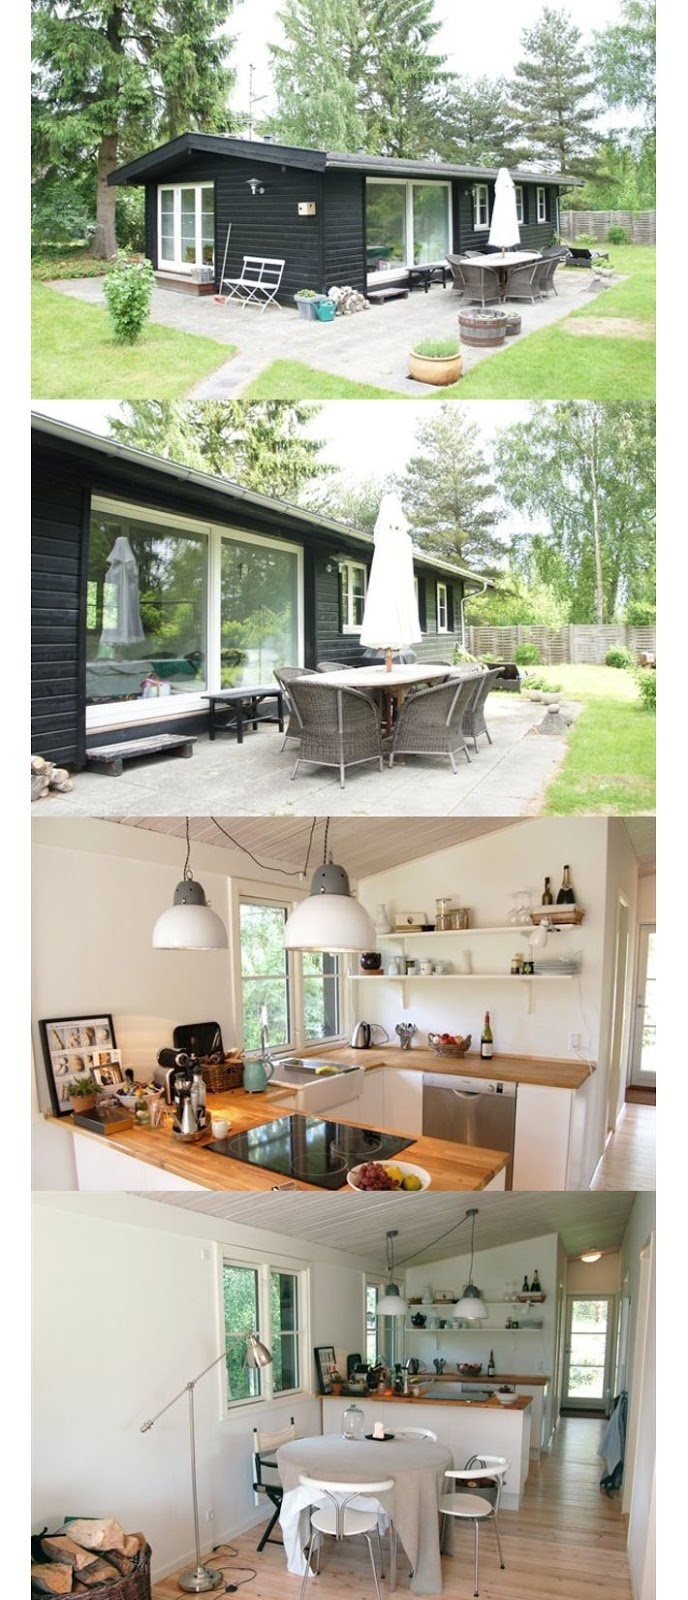 Amalie loves Denmark Urlaub in Dänemark #cottage in #Hornbæk